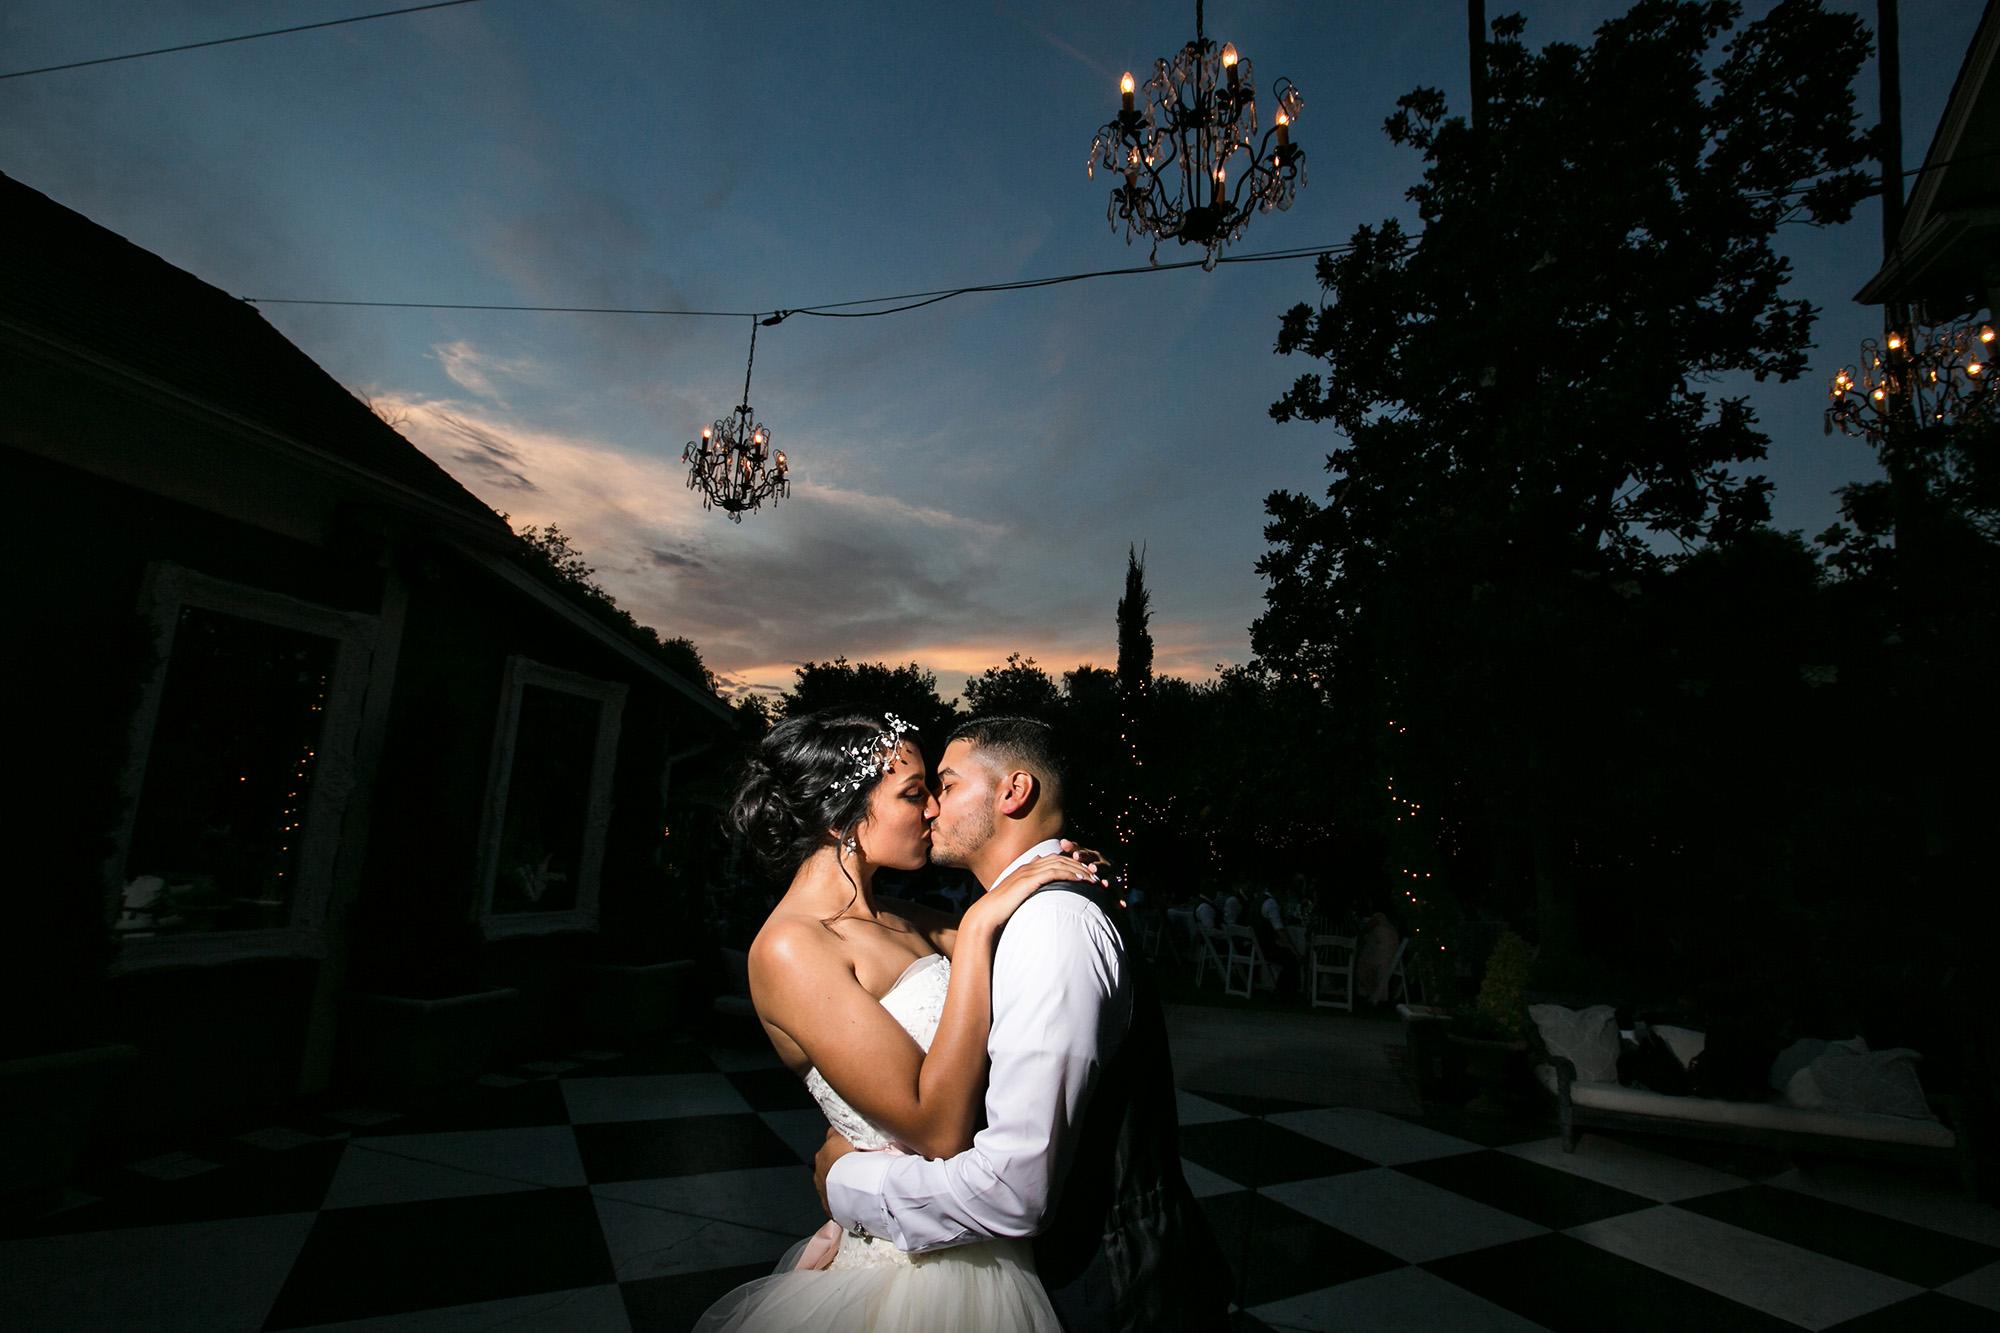 christmas-house-weddings-receptions-carrie-vines-258.jpg